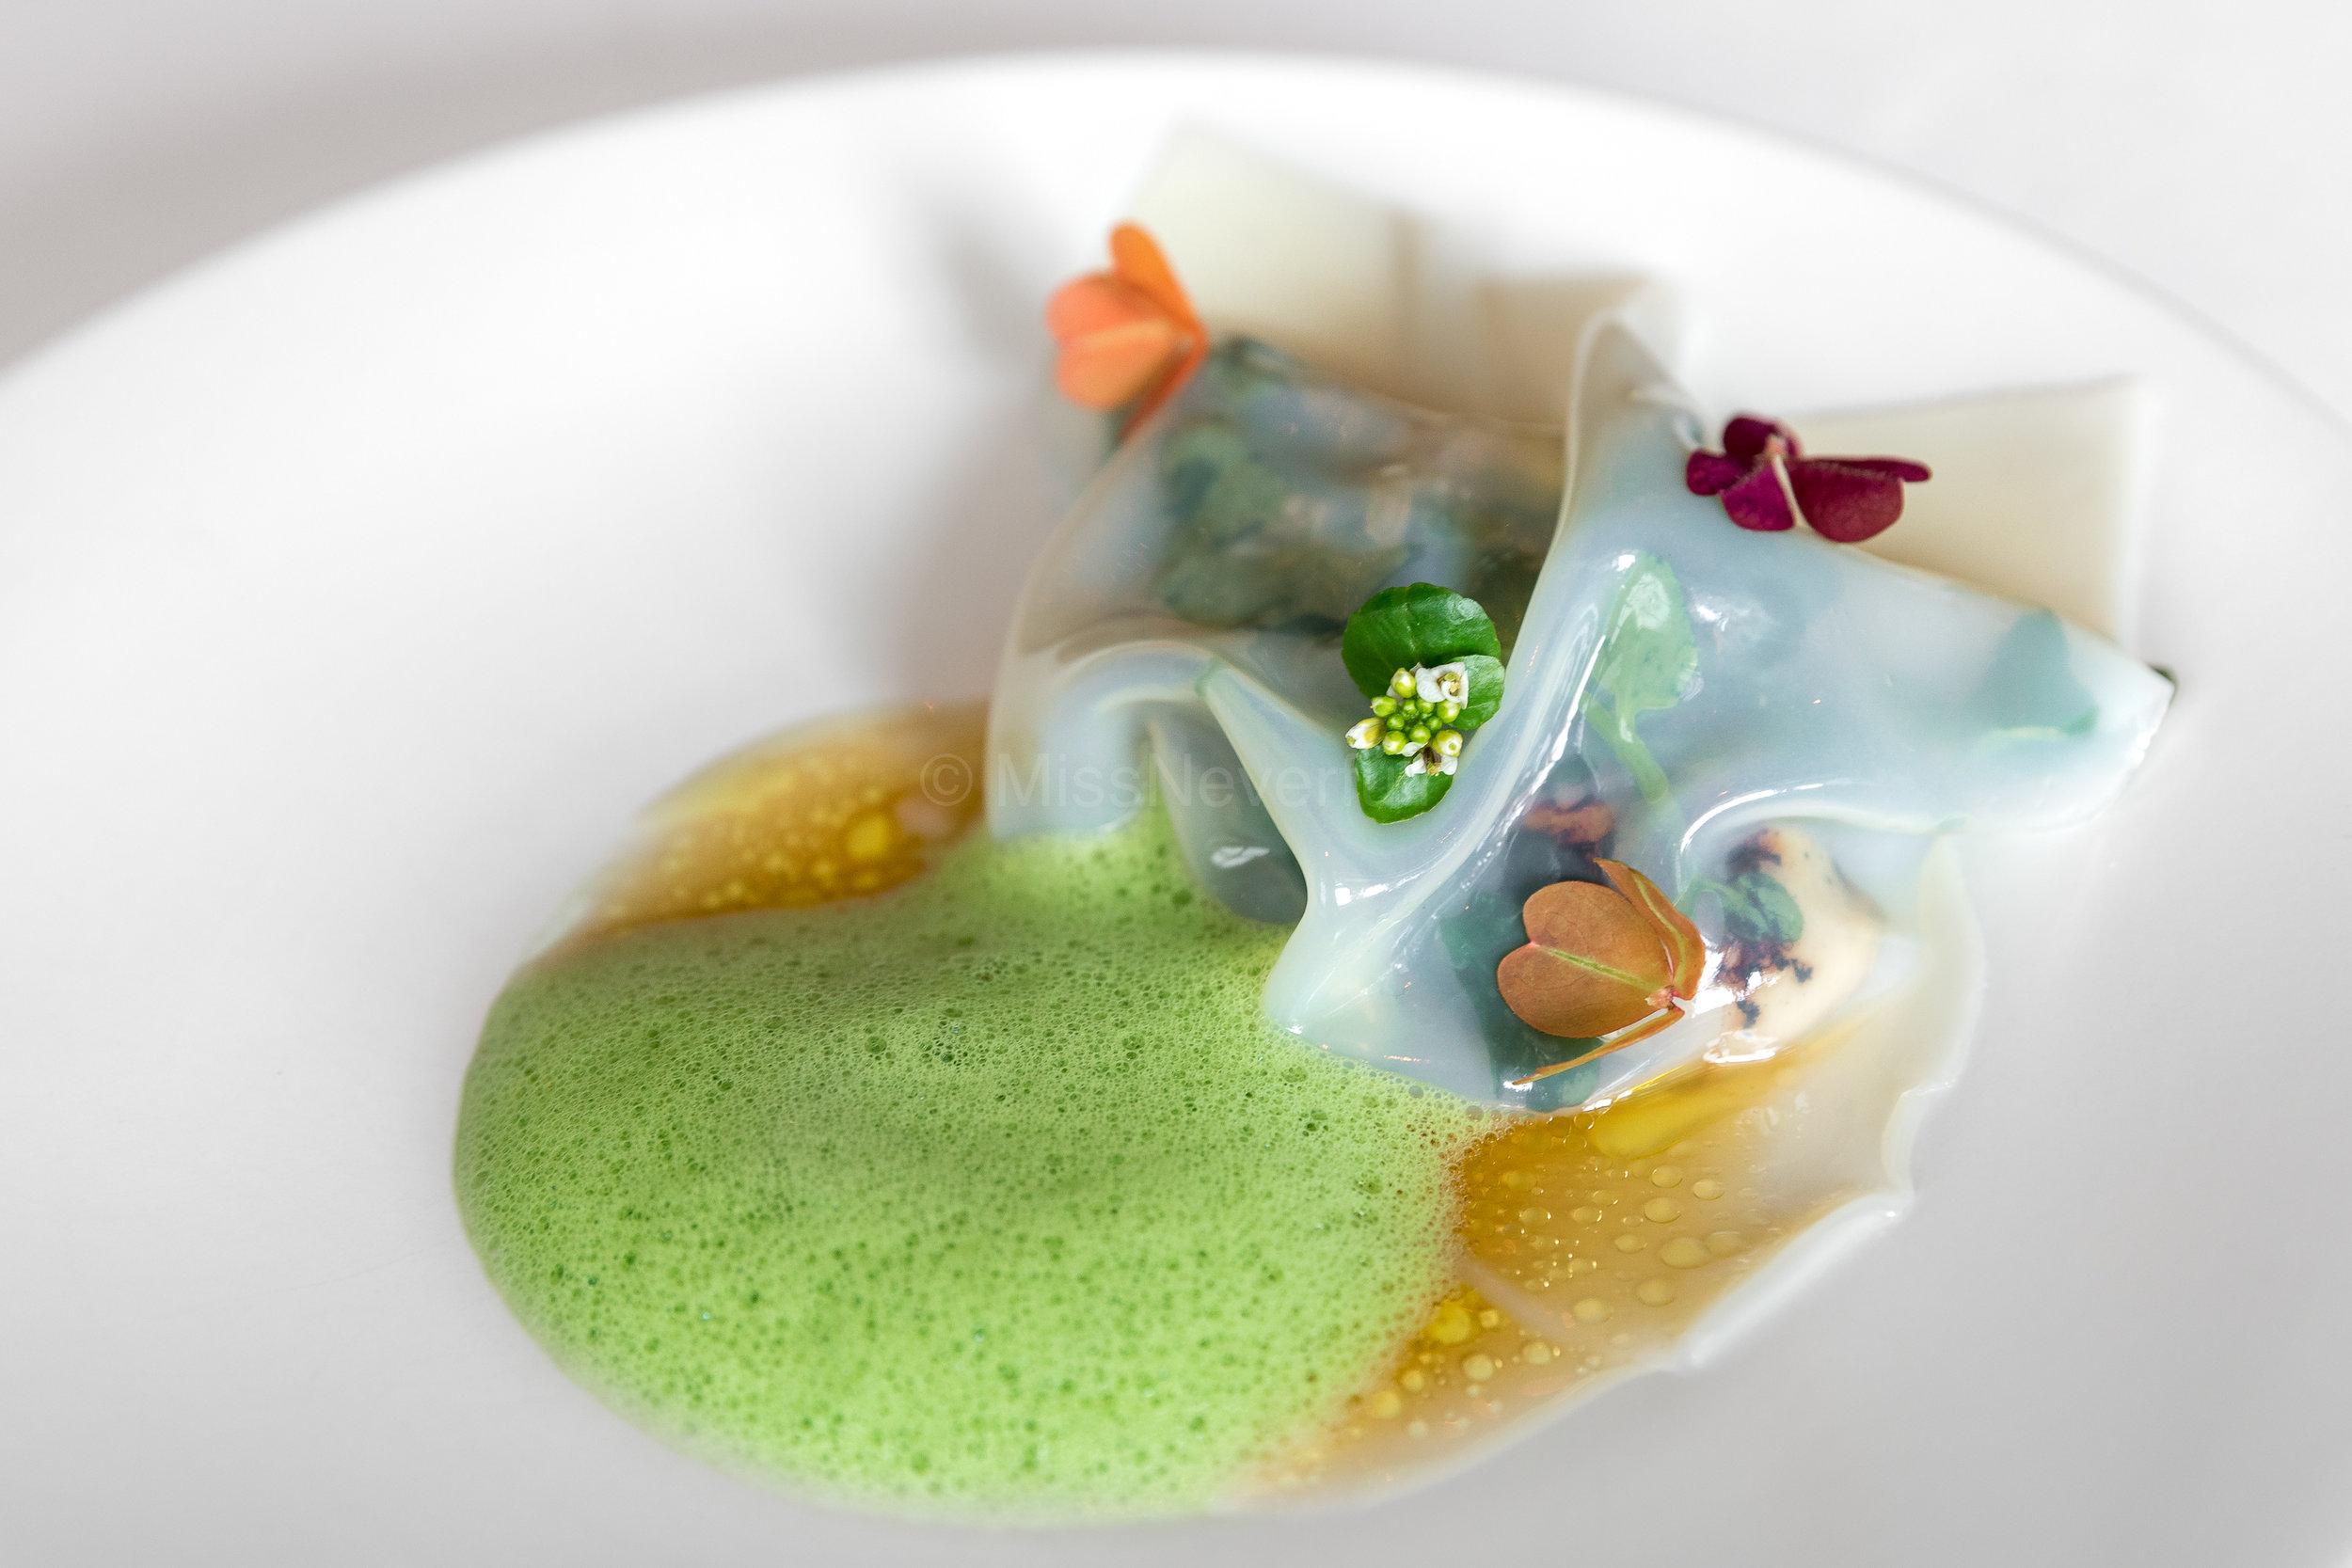 3. SOUTH: caviar aubergine, scallop lasagne, burnt oyster